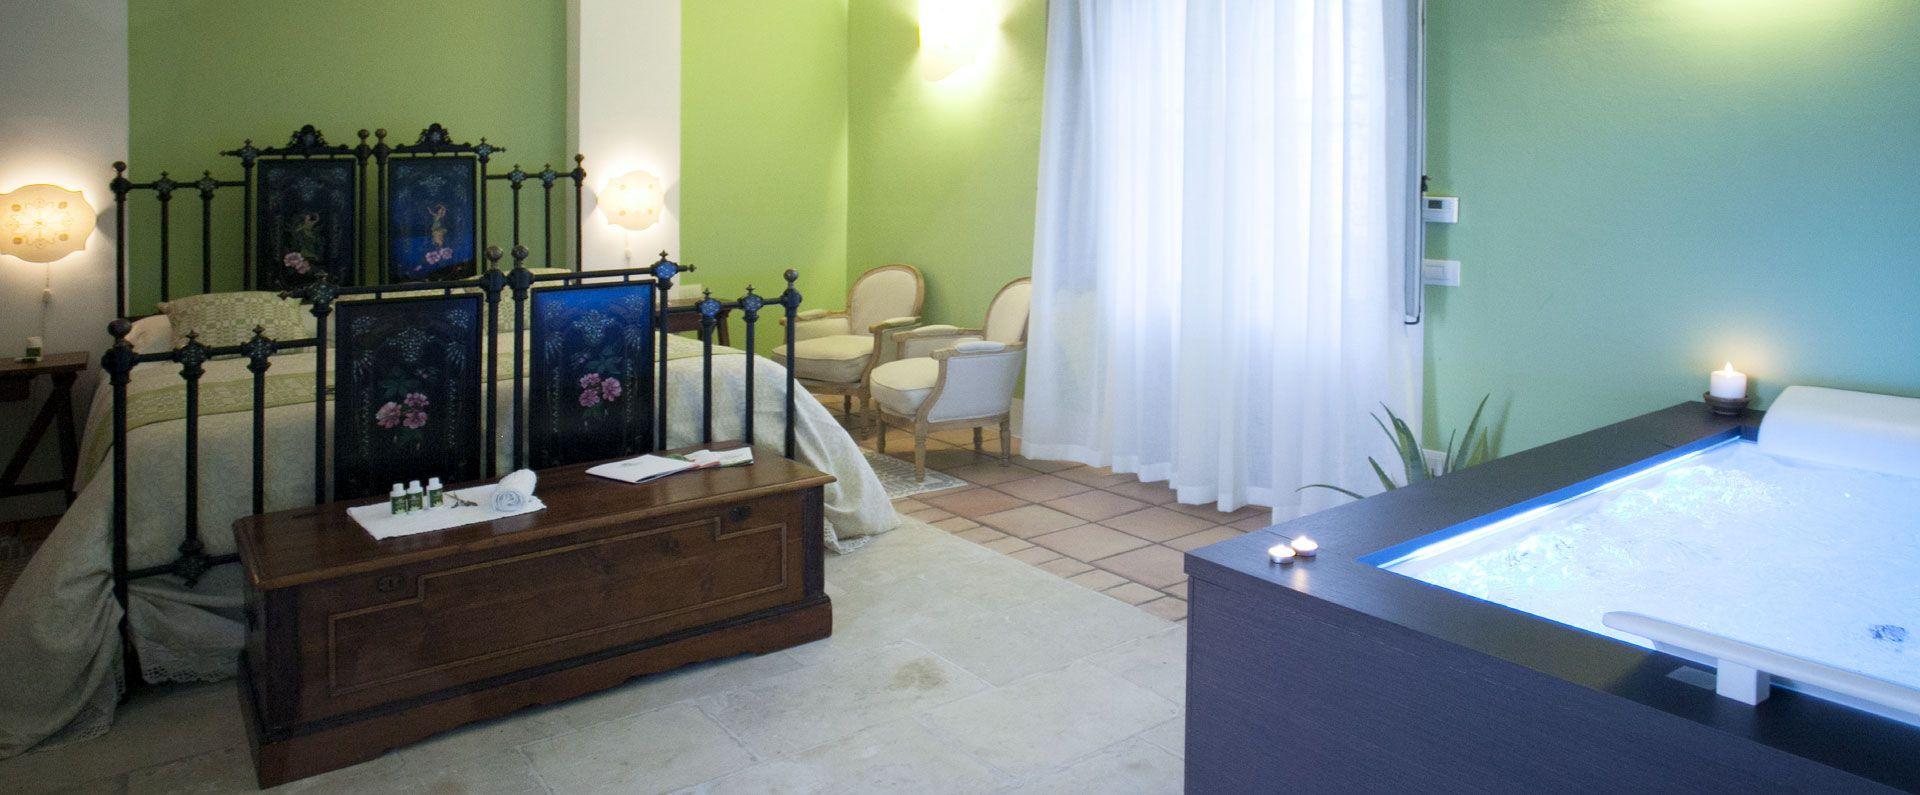 #camera #aloe #vera #naturalis #bio #resort #martano #puglia #salento